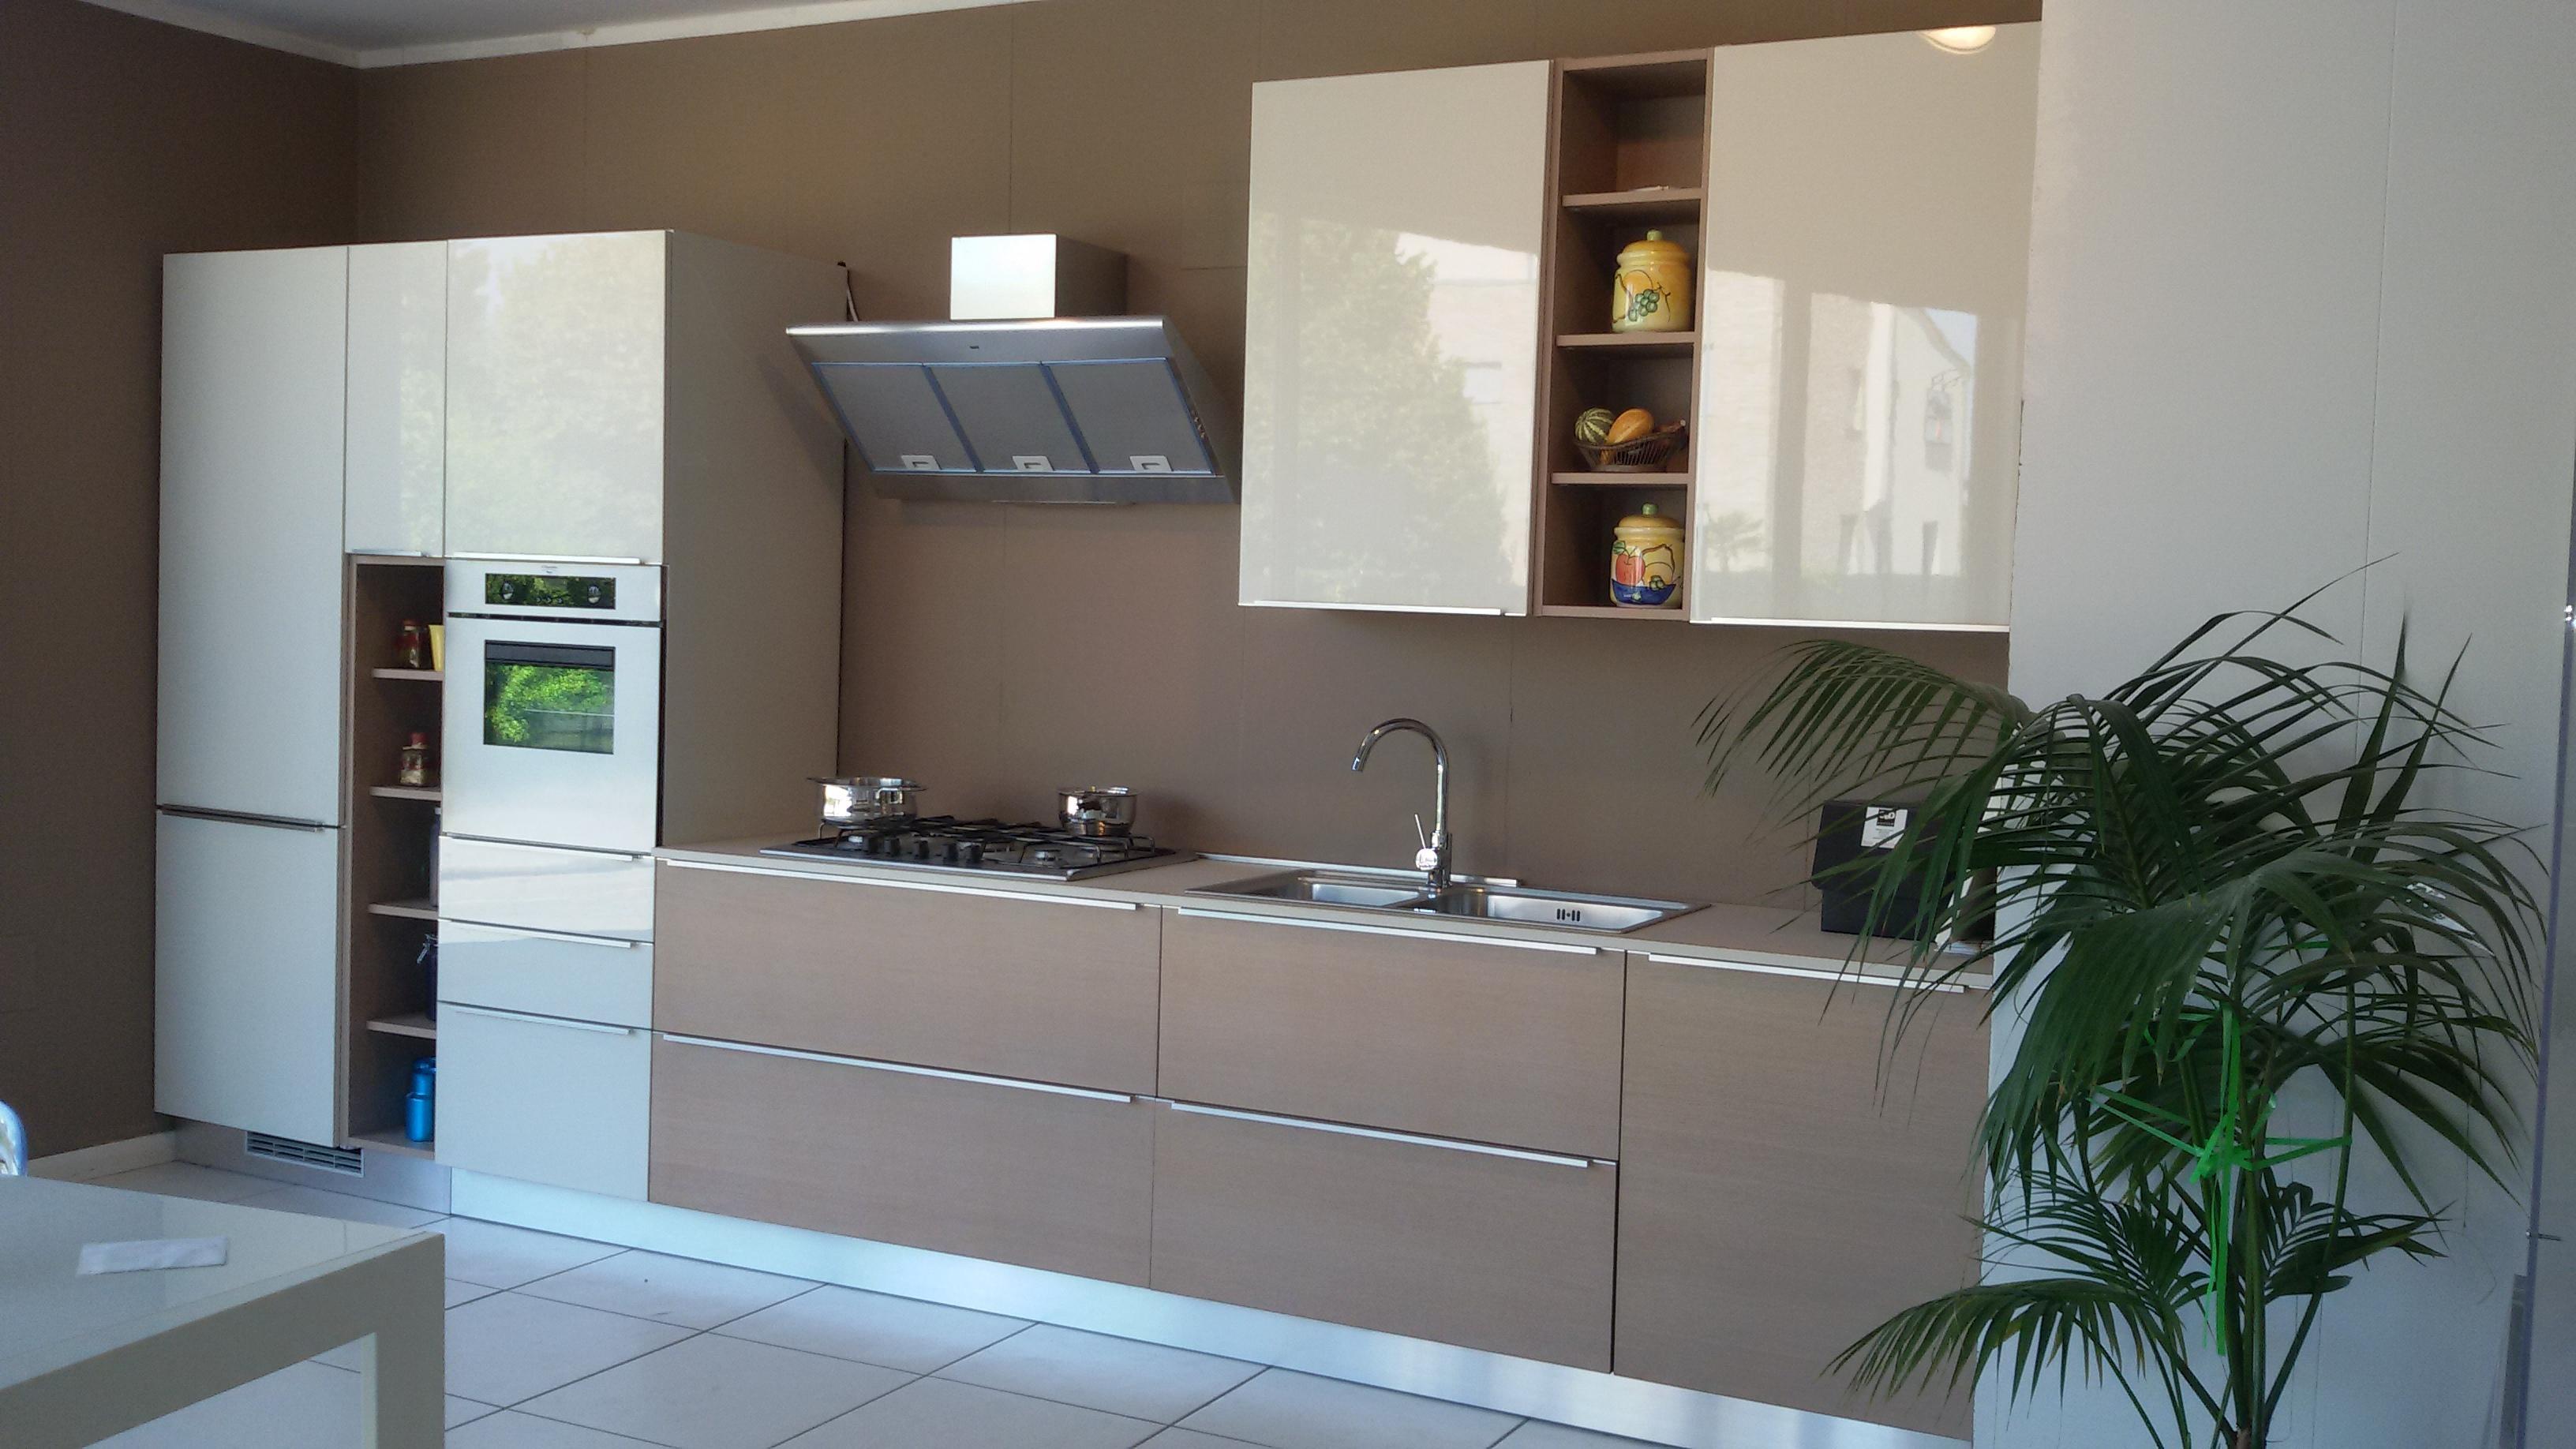 Ged cucine cucina cucina seta legno e laccato lucido for Cucina legno bianco